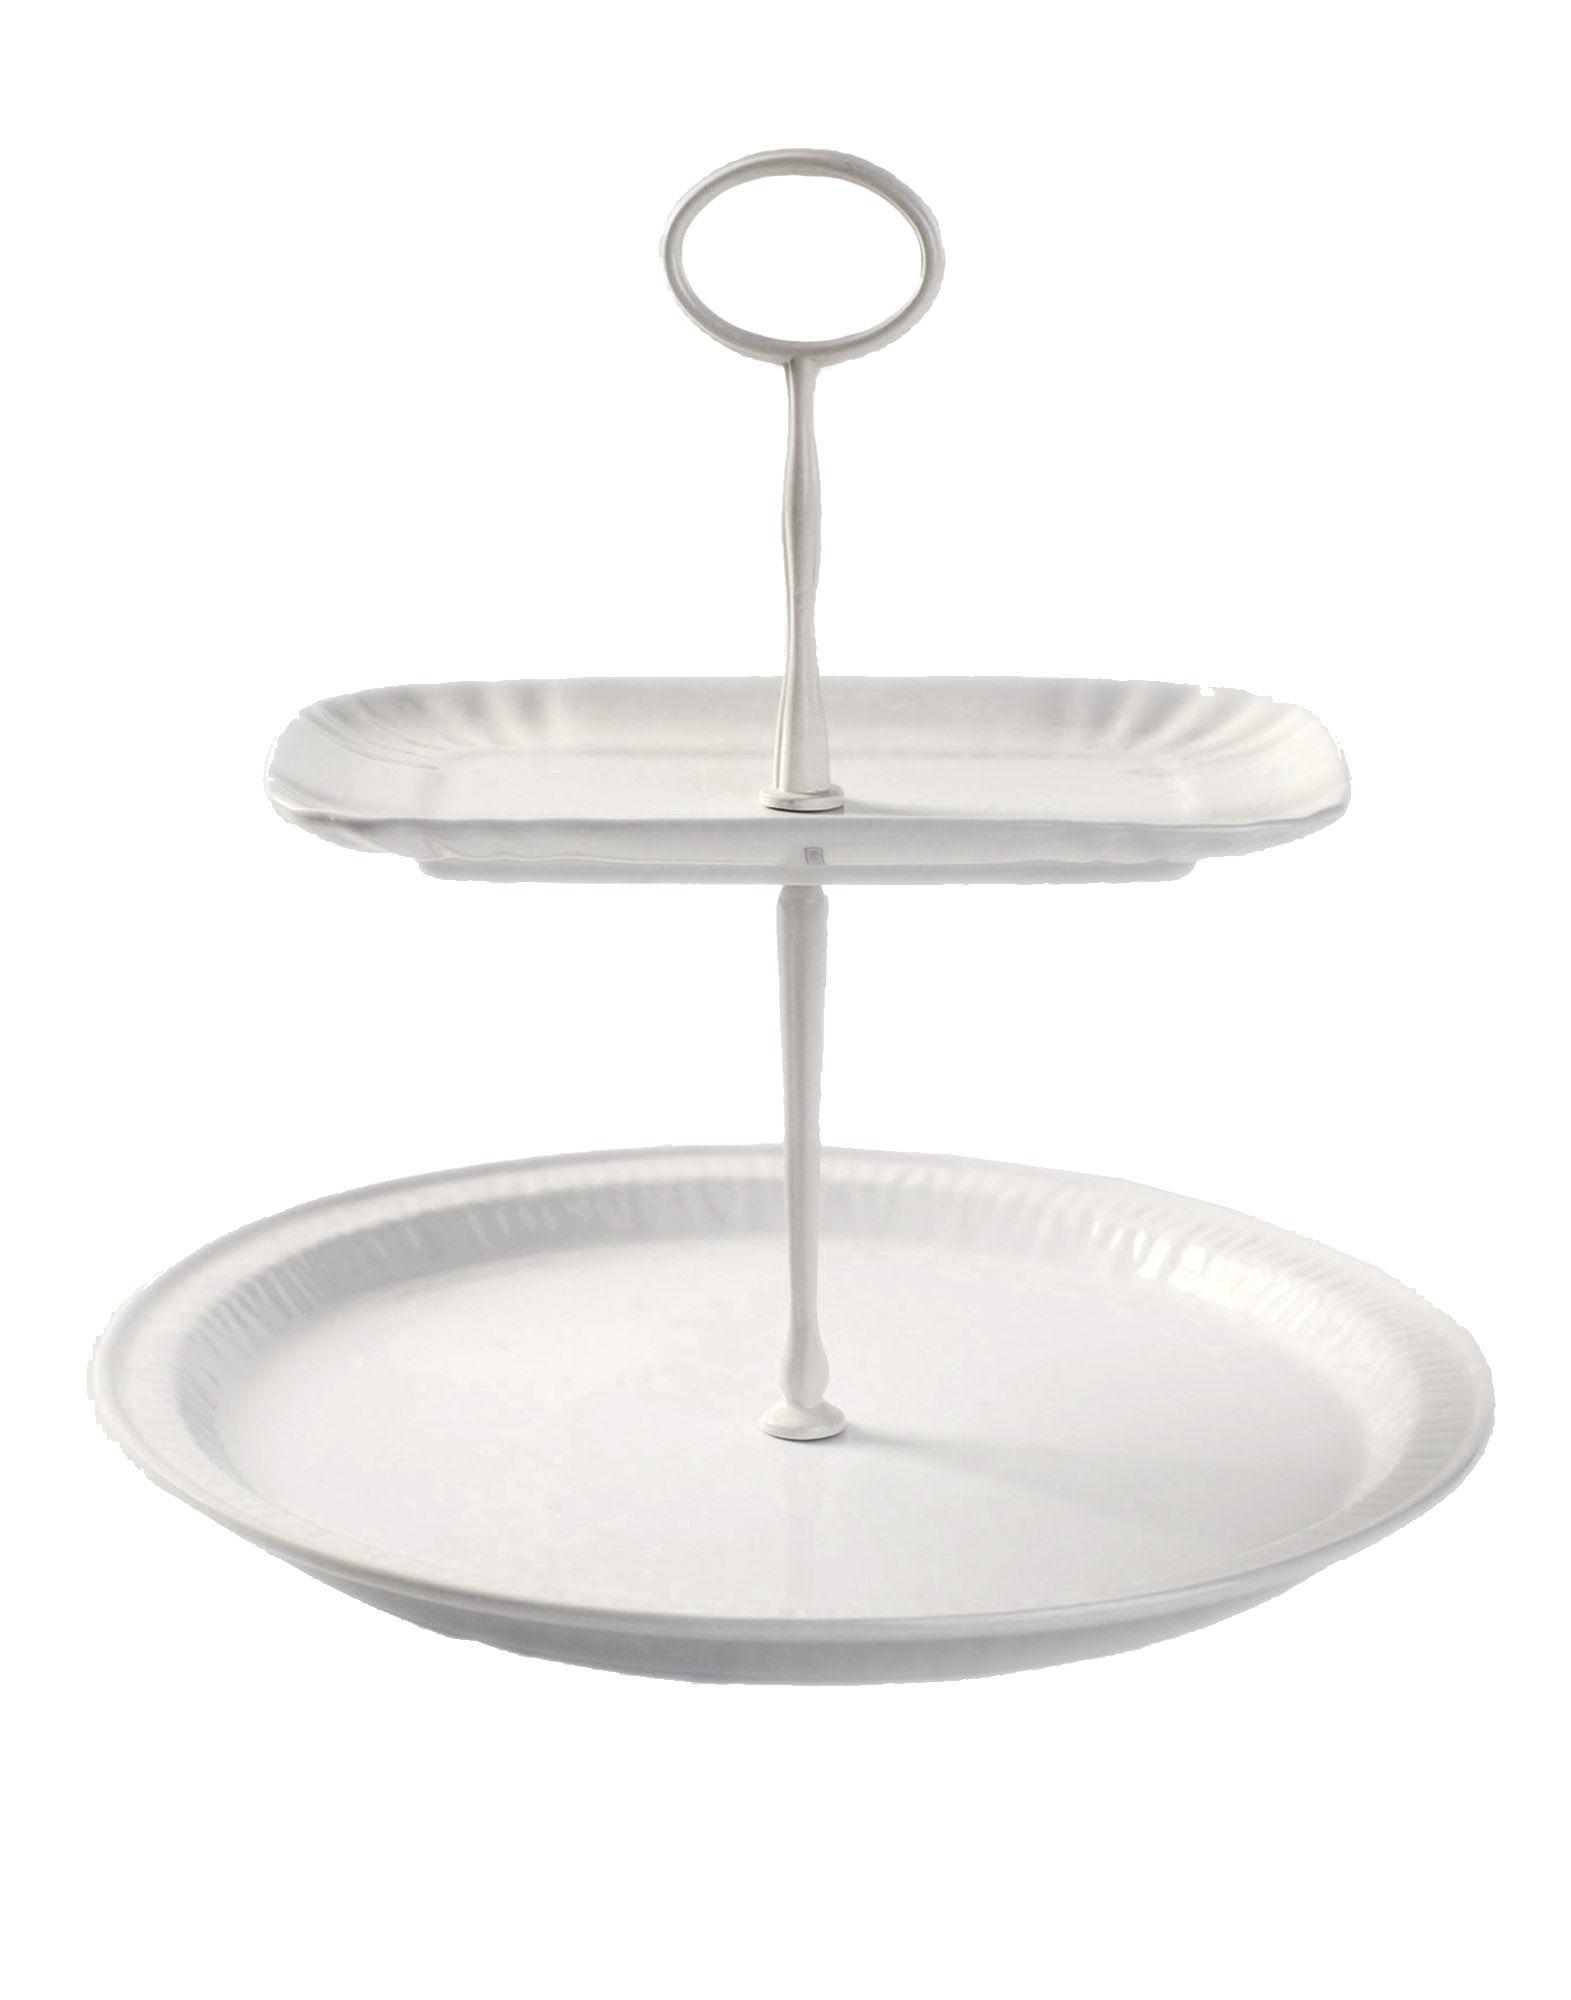 SELETTI Украшение для стола decorative kitchenware borosilicate glass oilcan